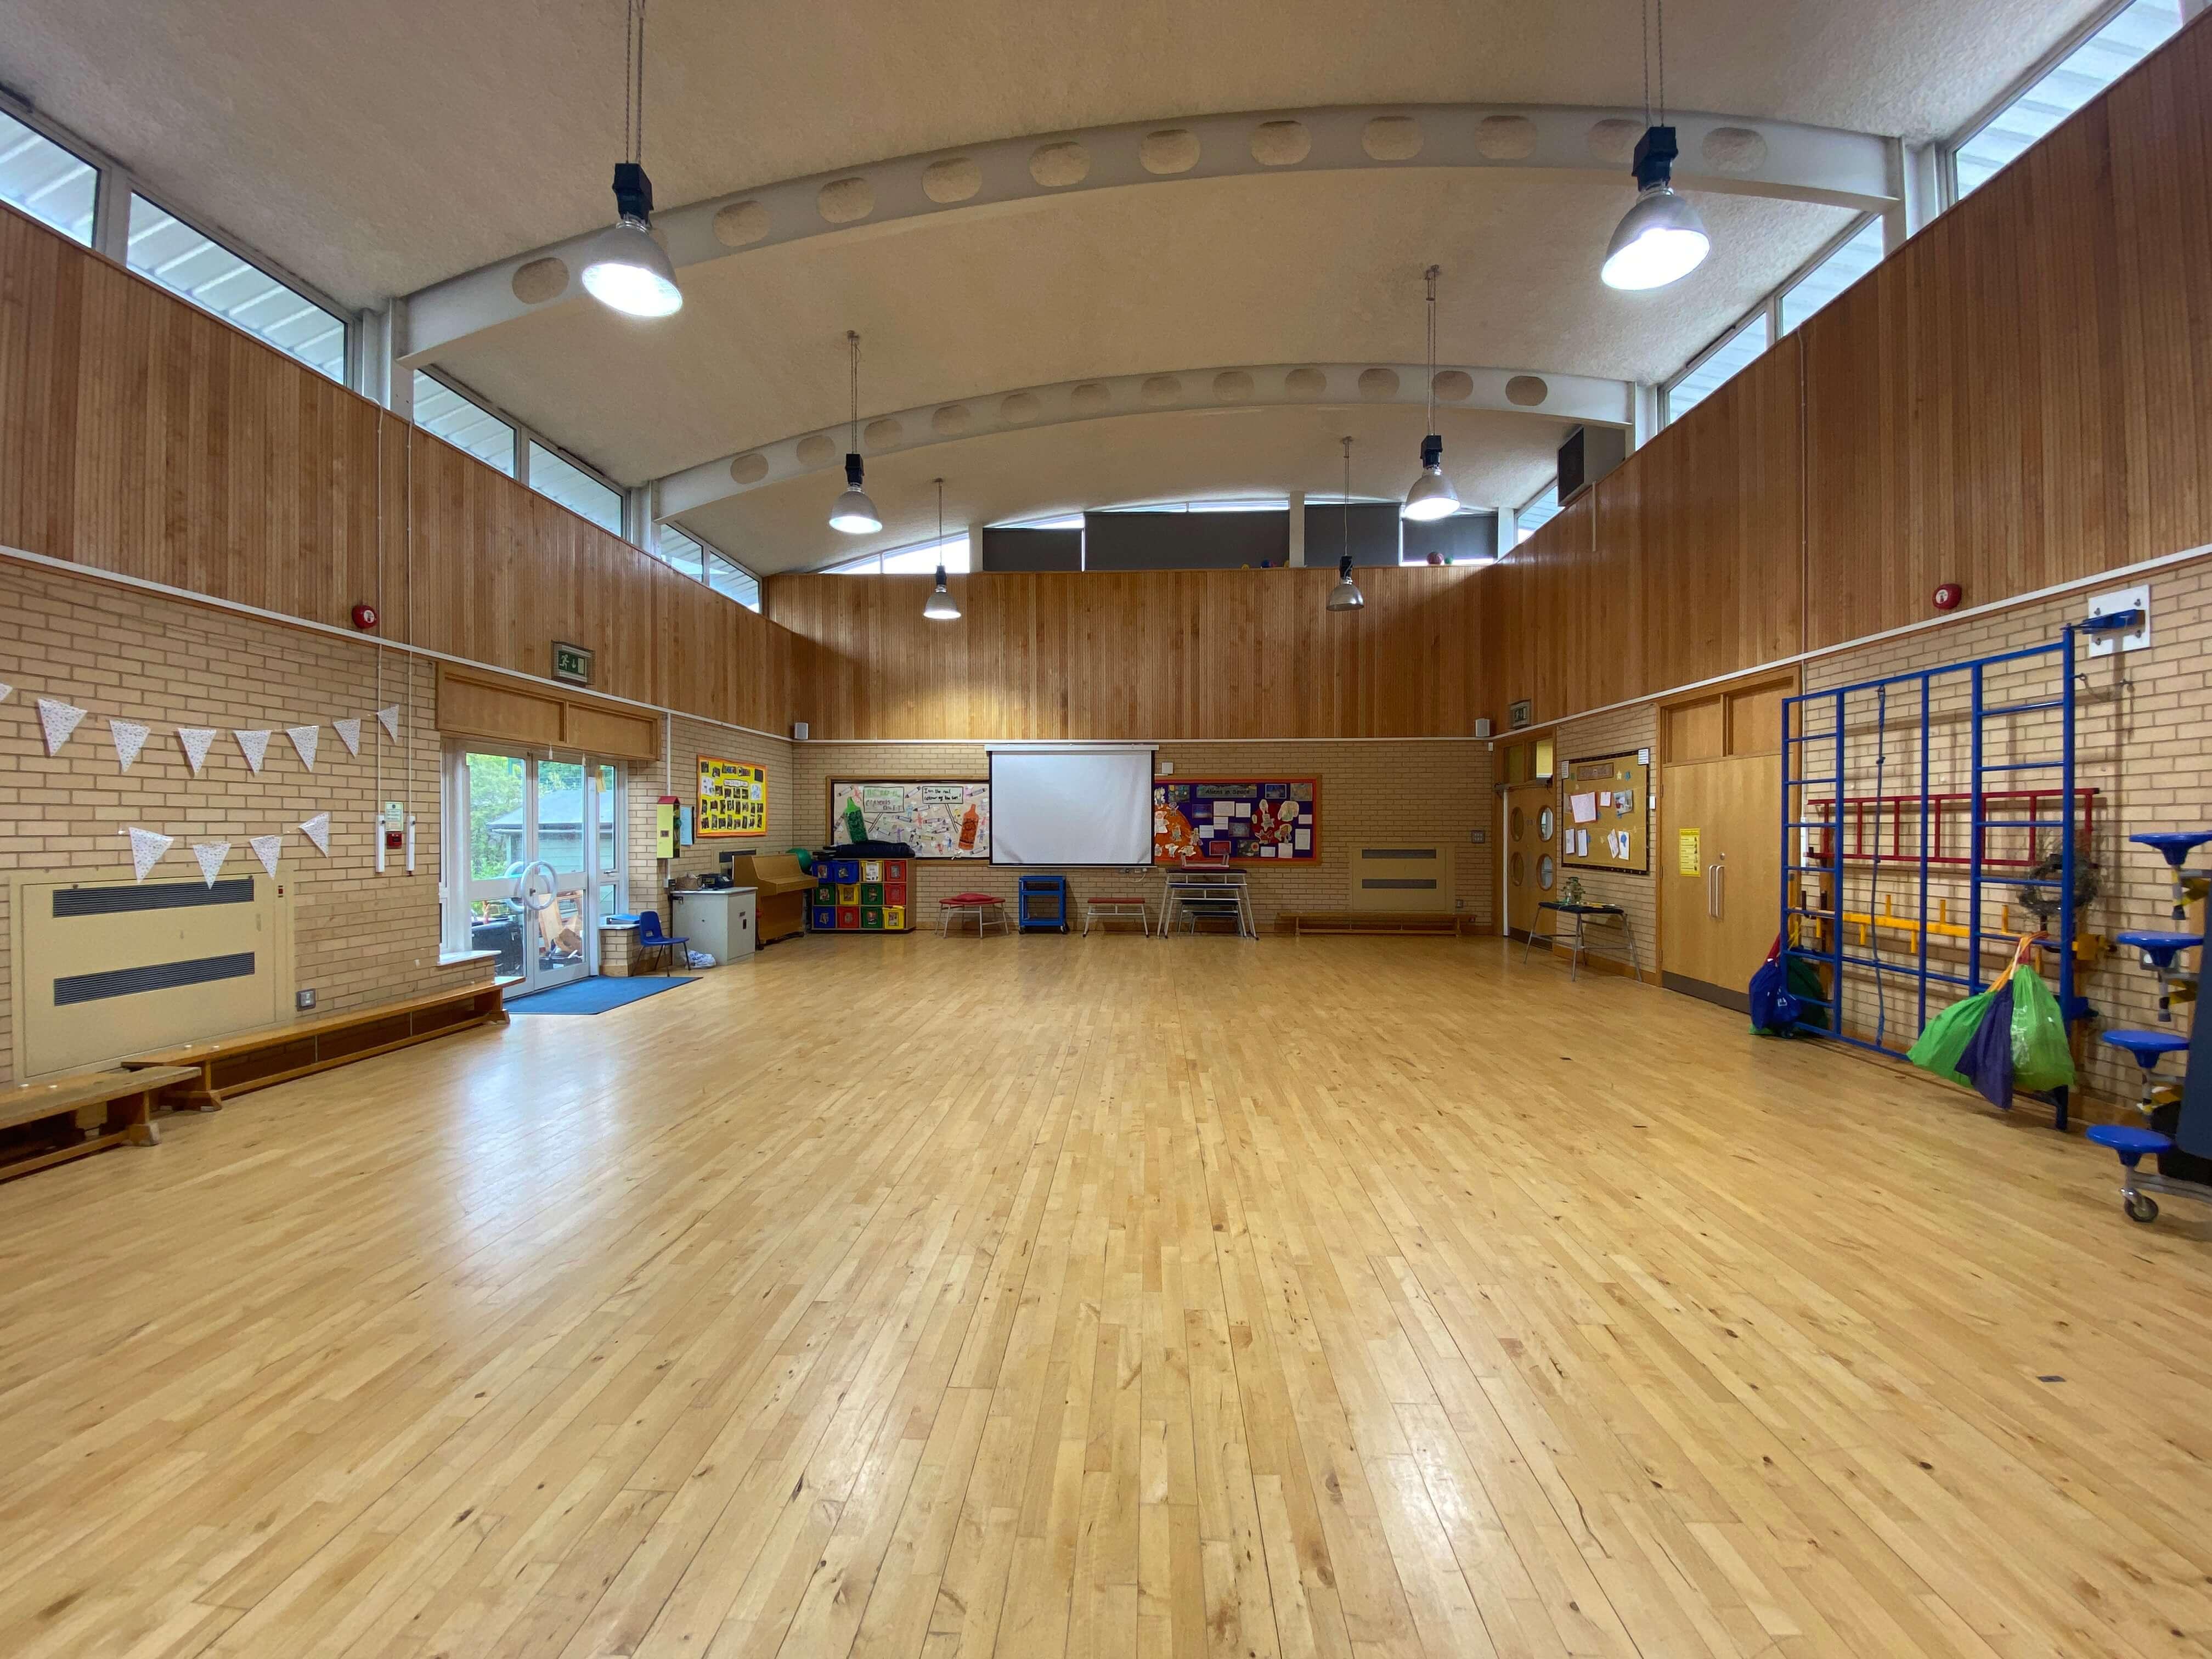 Queenswell Infant & Nursery School Main Hall